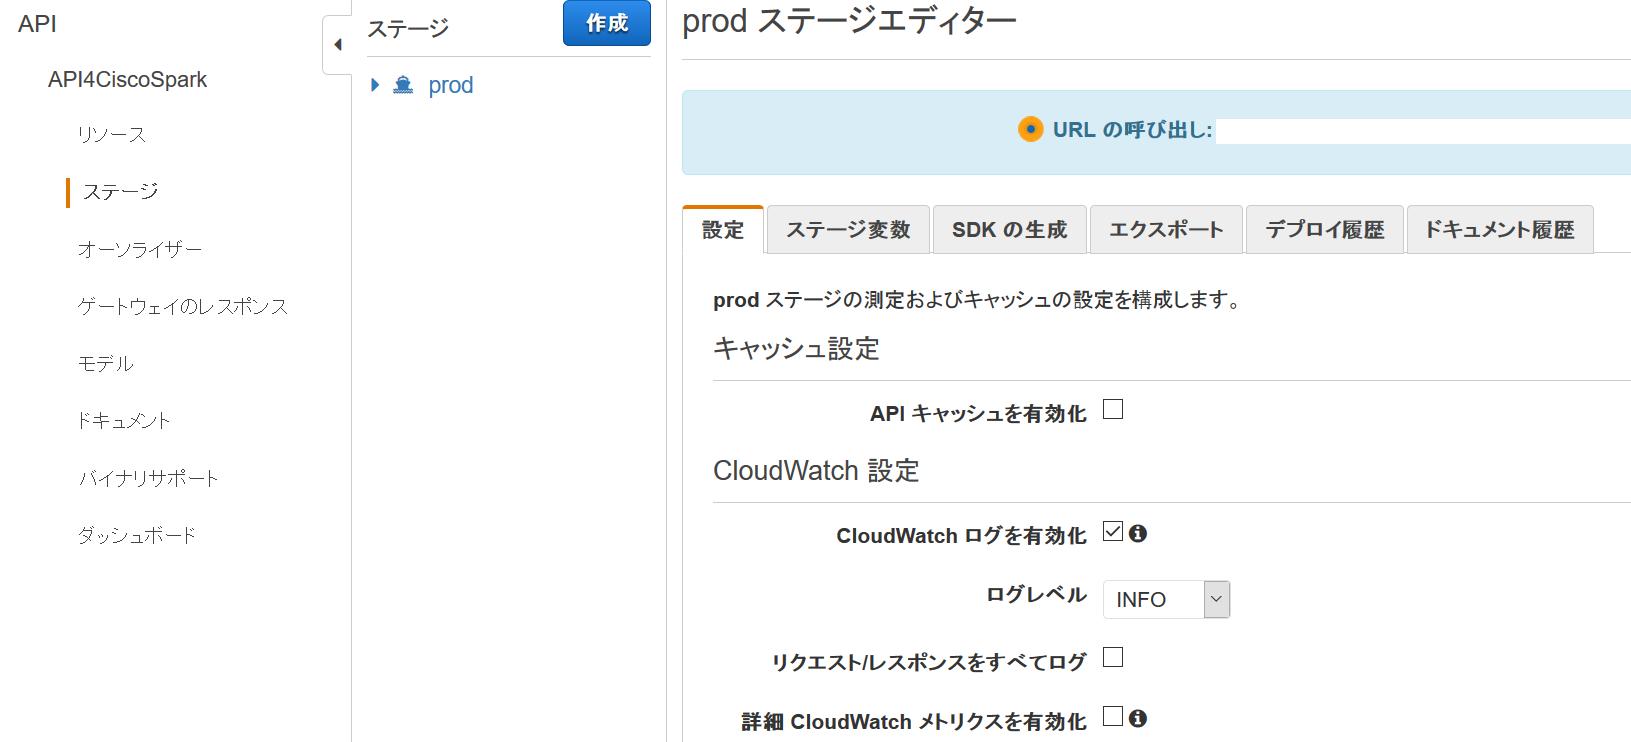 API_Gateway_step8.png